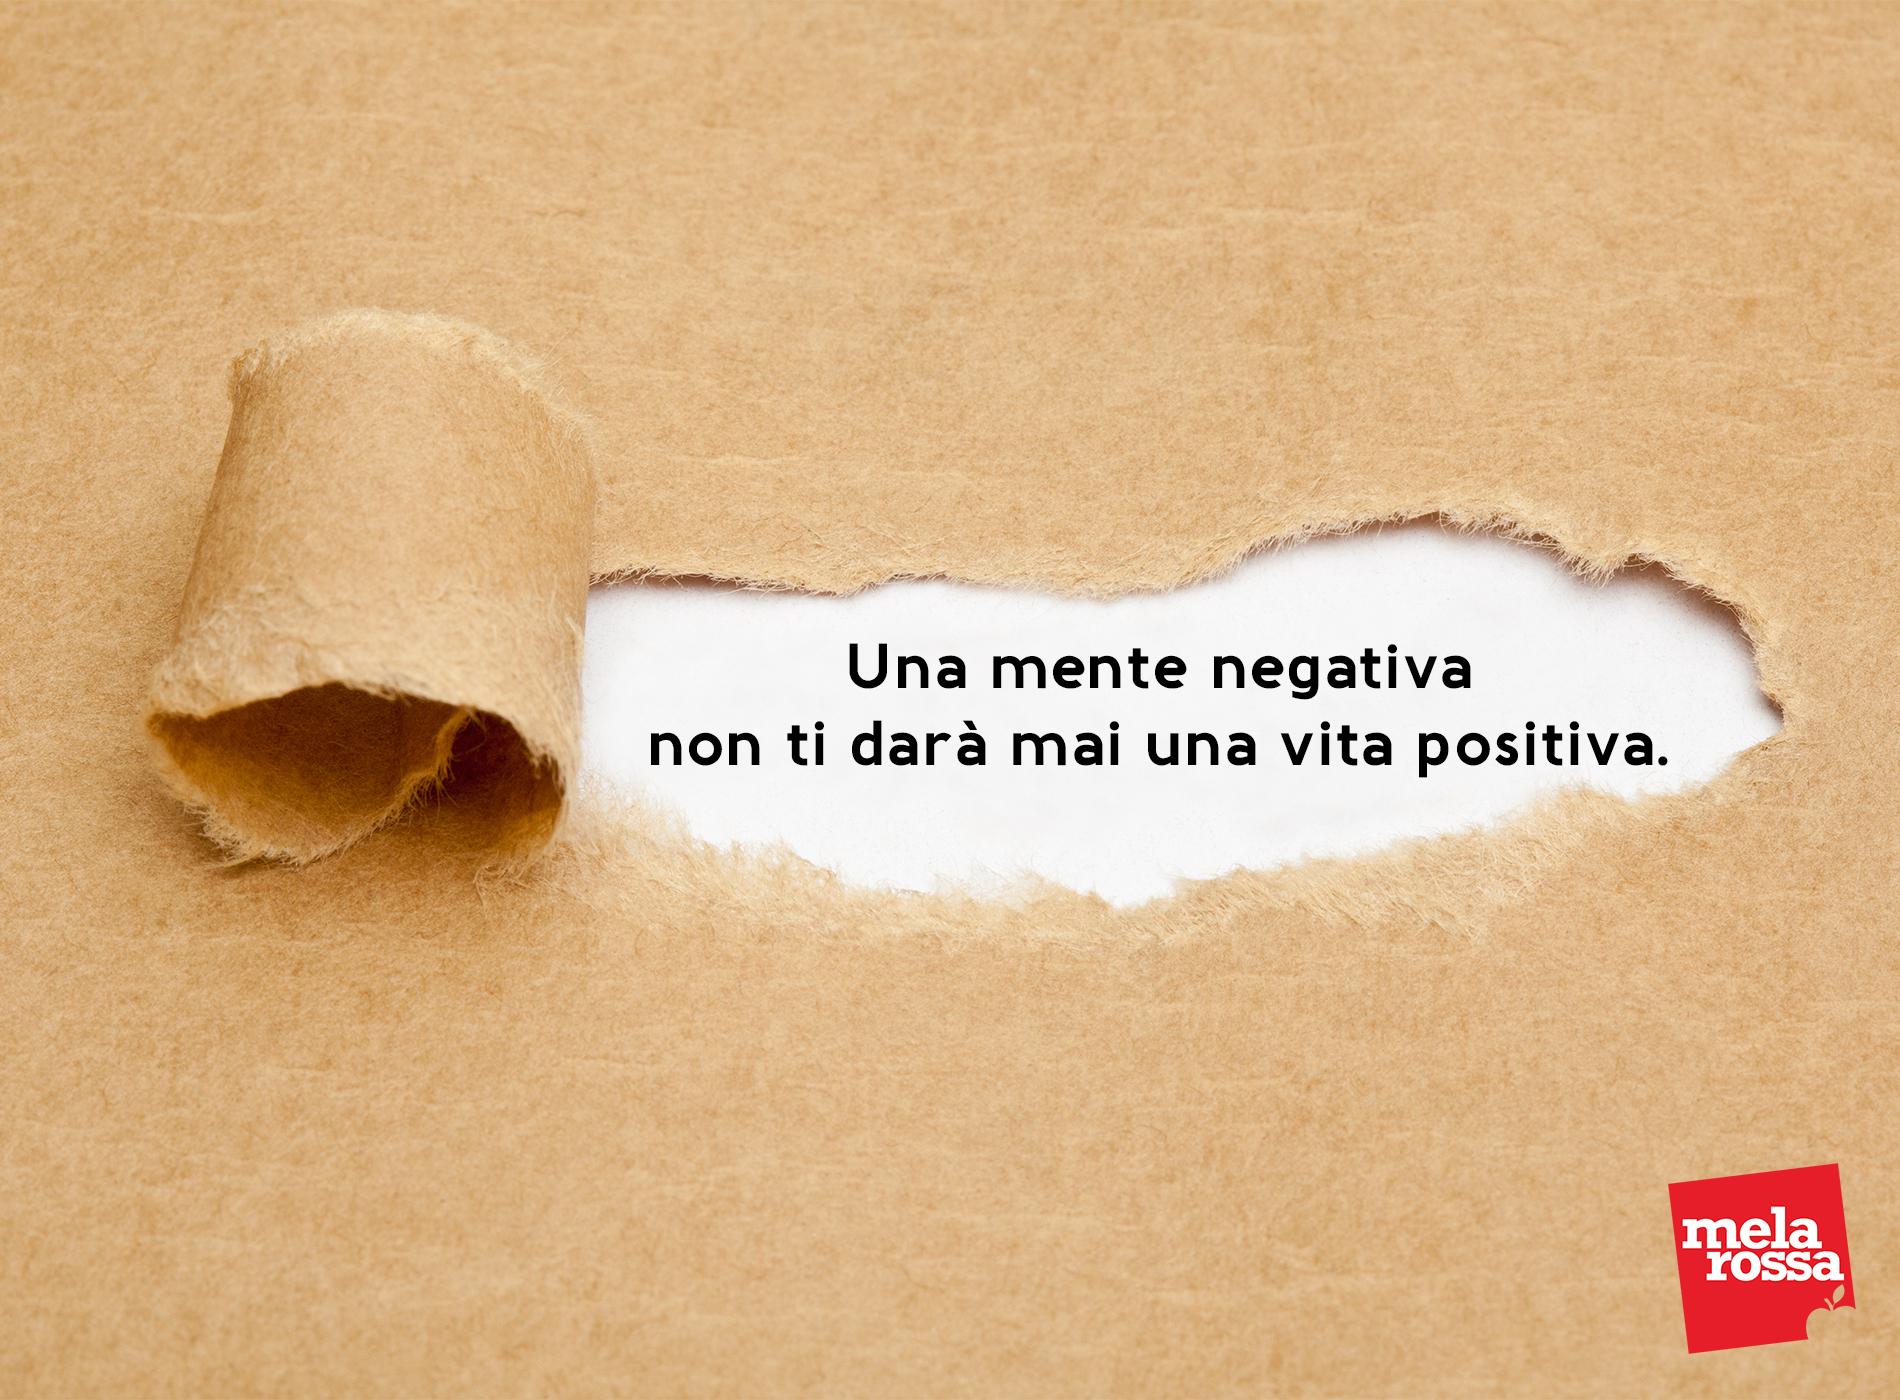 mindfulness: come cacciare i pensieri negativi